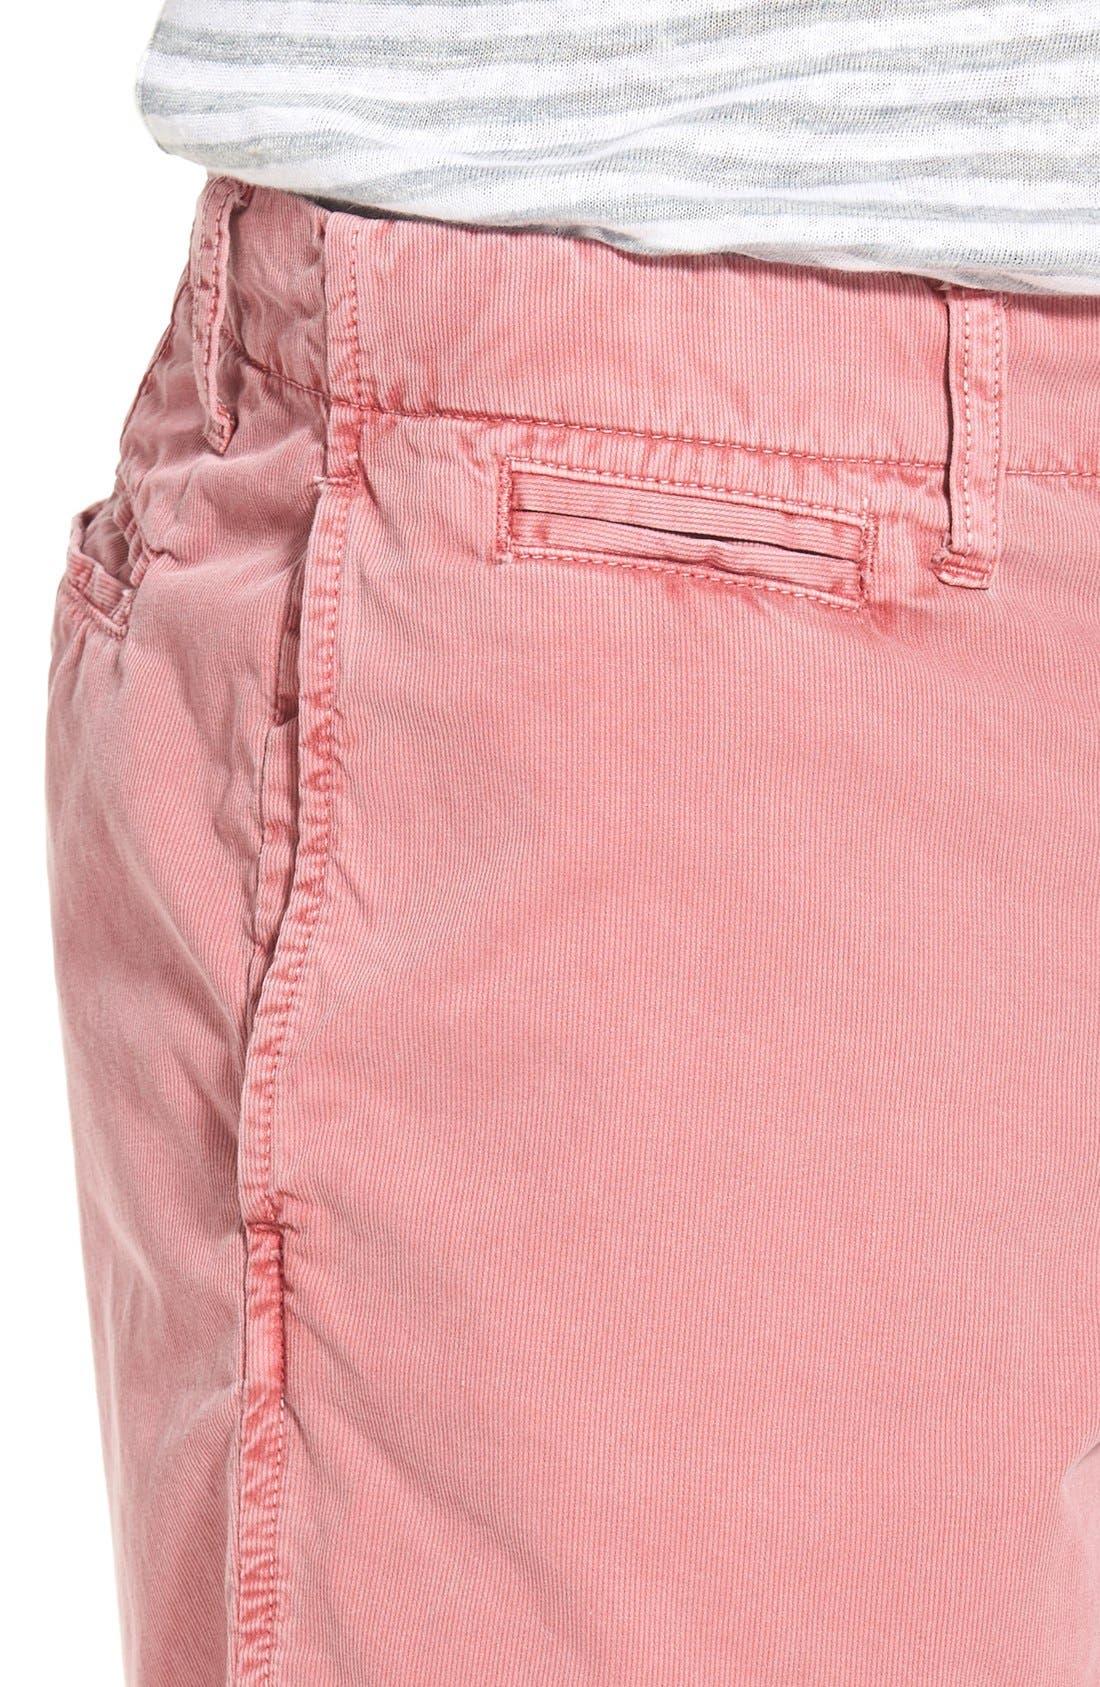 'St. Barts' Raw Edge Shorts,                             Alternate thumbnail 4, color,                             Cranberry